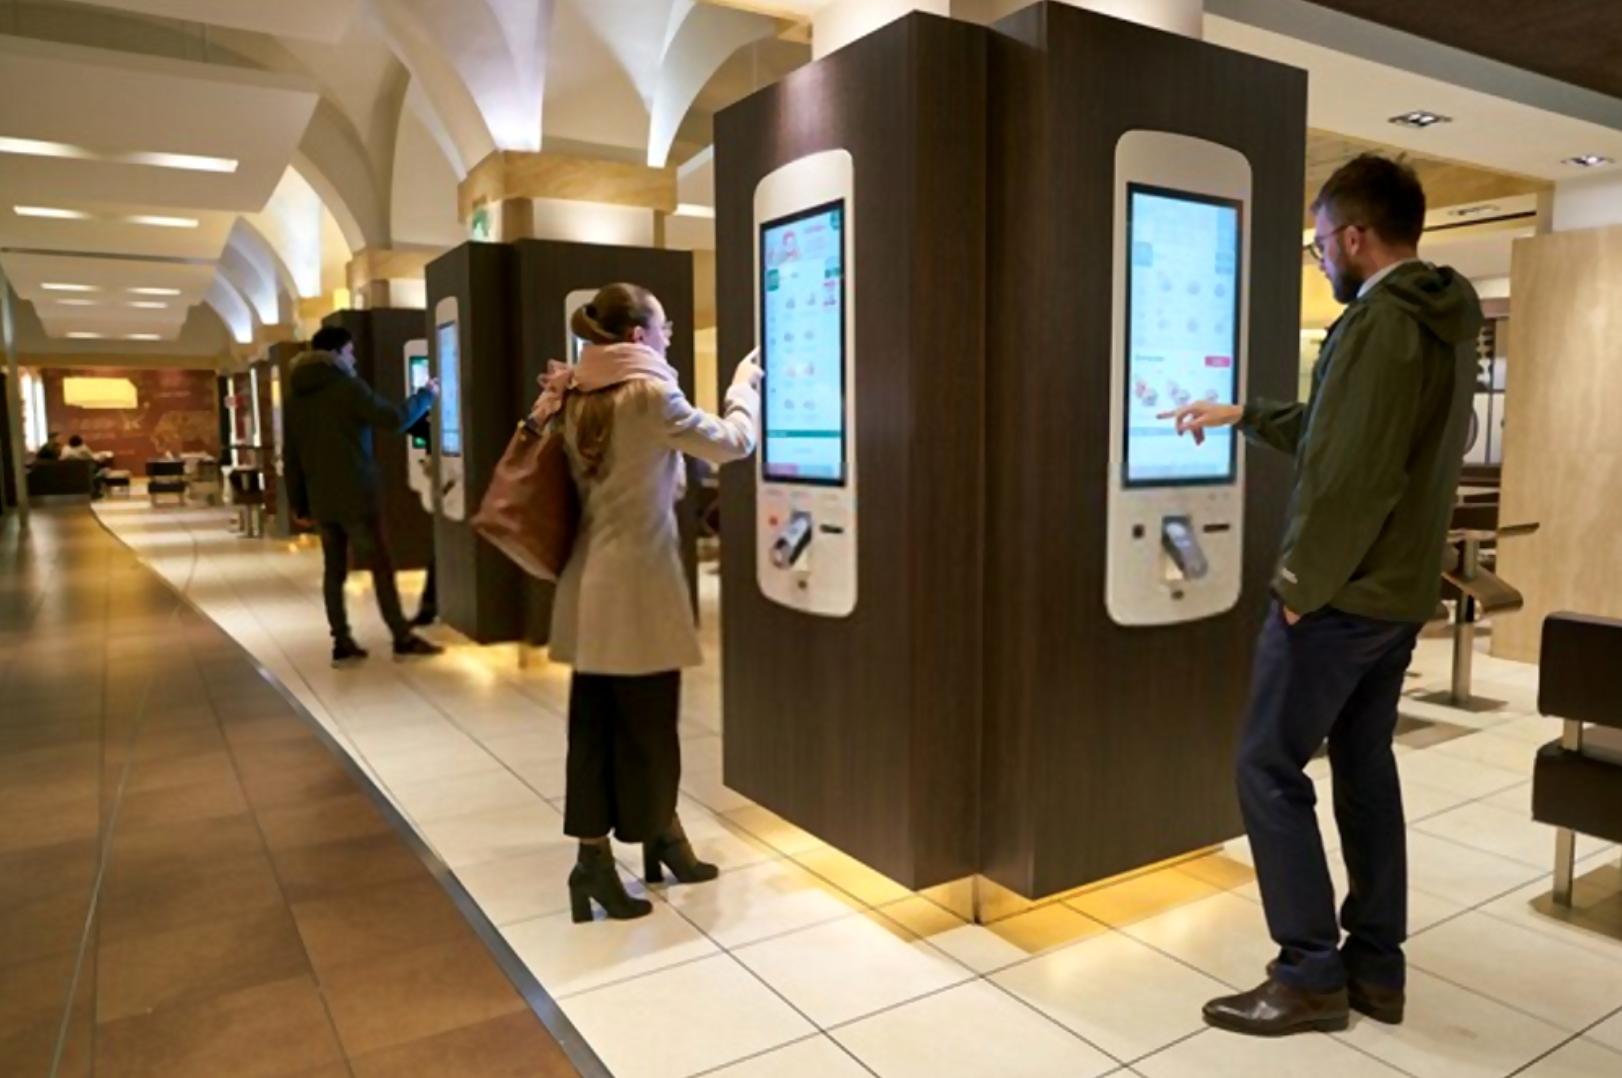 Customer self service kiosks